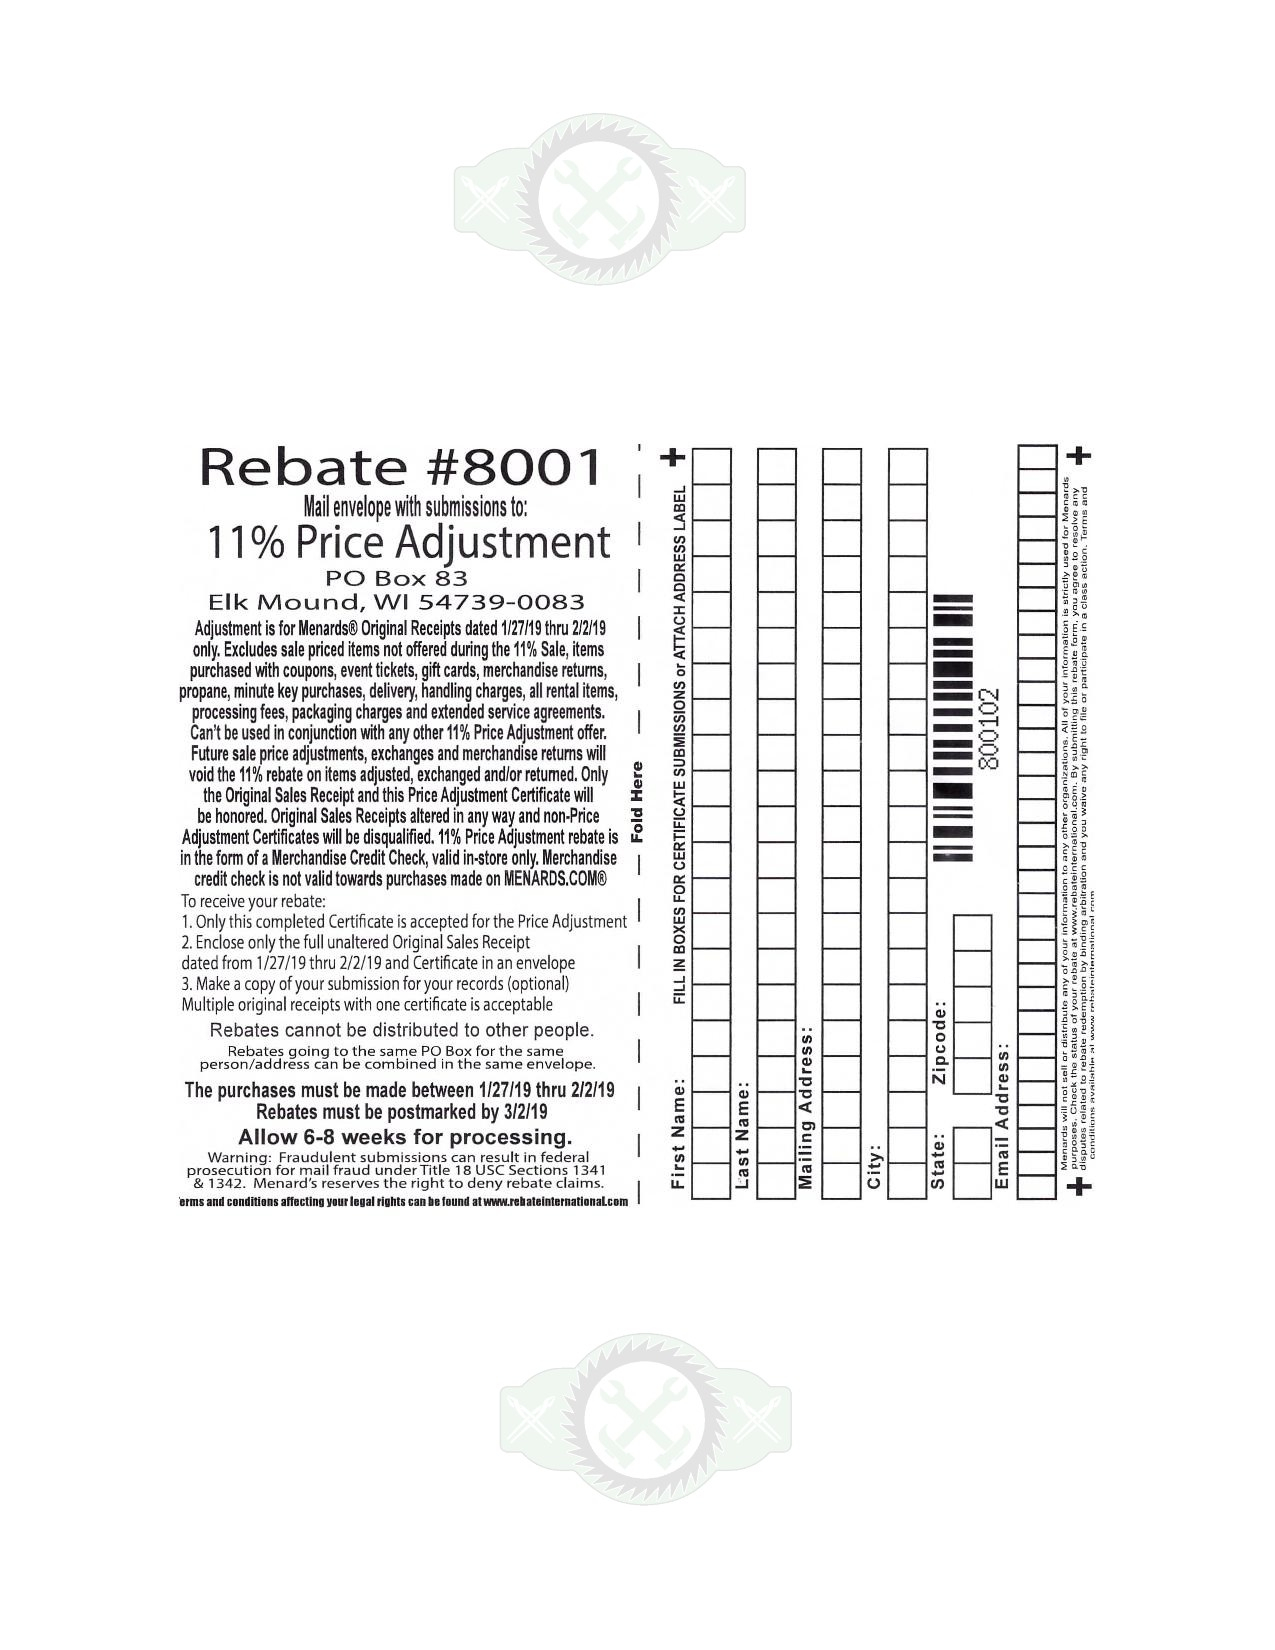 Menards Rebate Adjustment Form January 2021